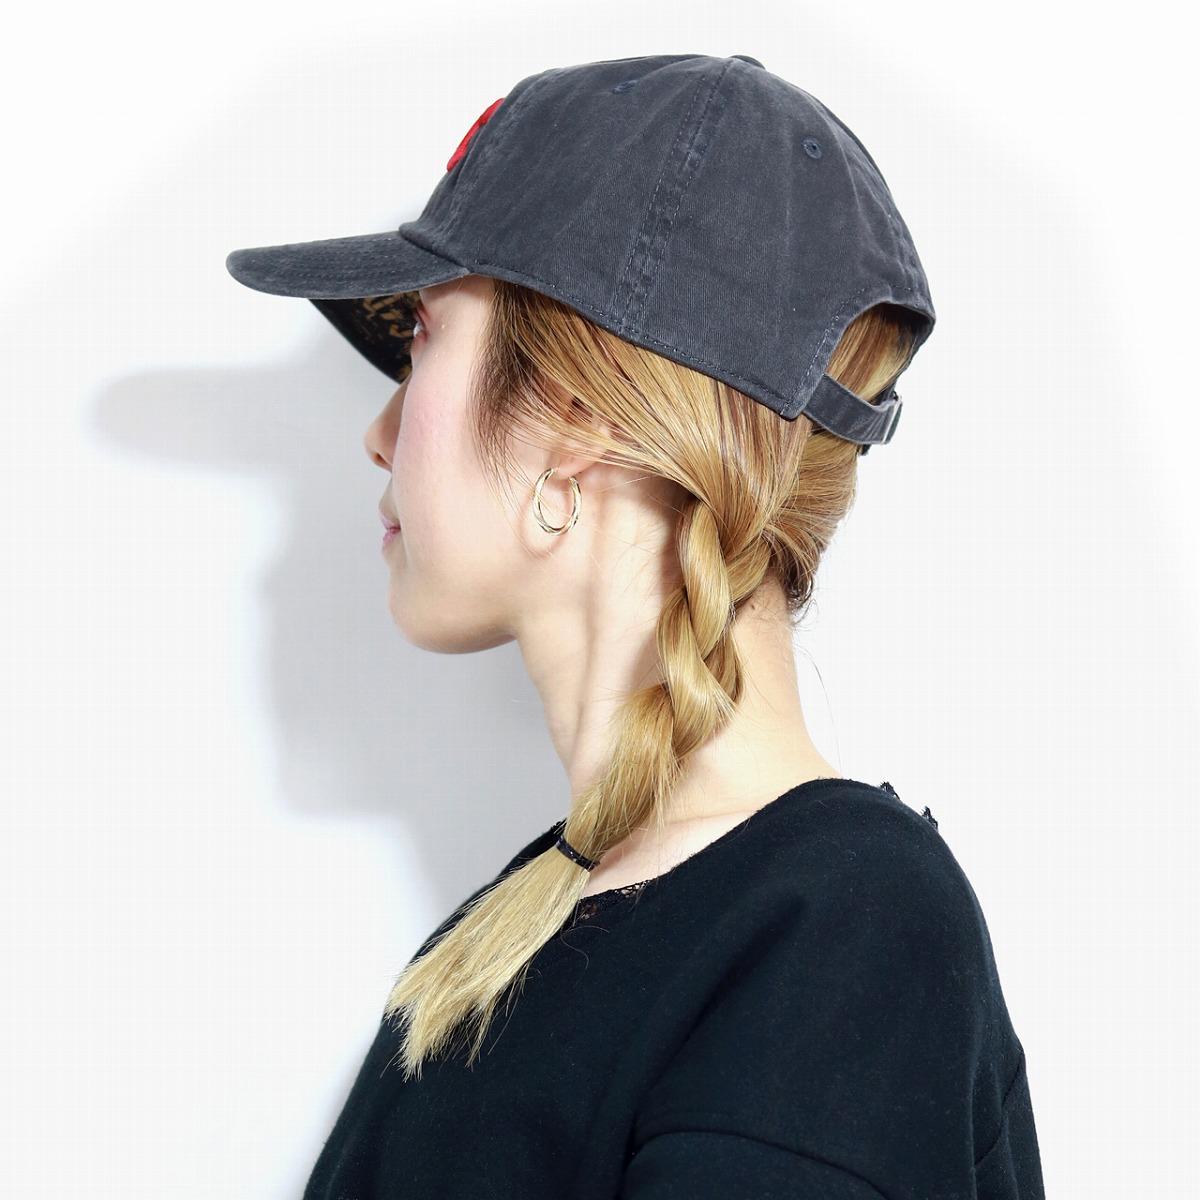 Band cap ACDC cap oar season cotton men s American needle Lady s hat  AMERICAN NEEDLE AC DC black black db43227118c